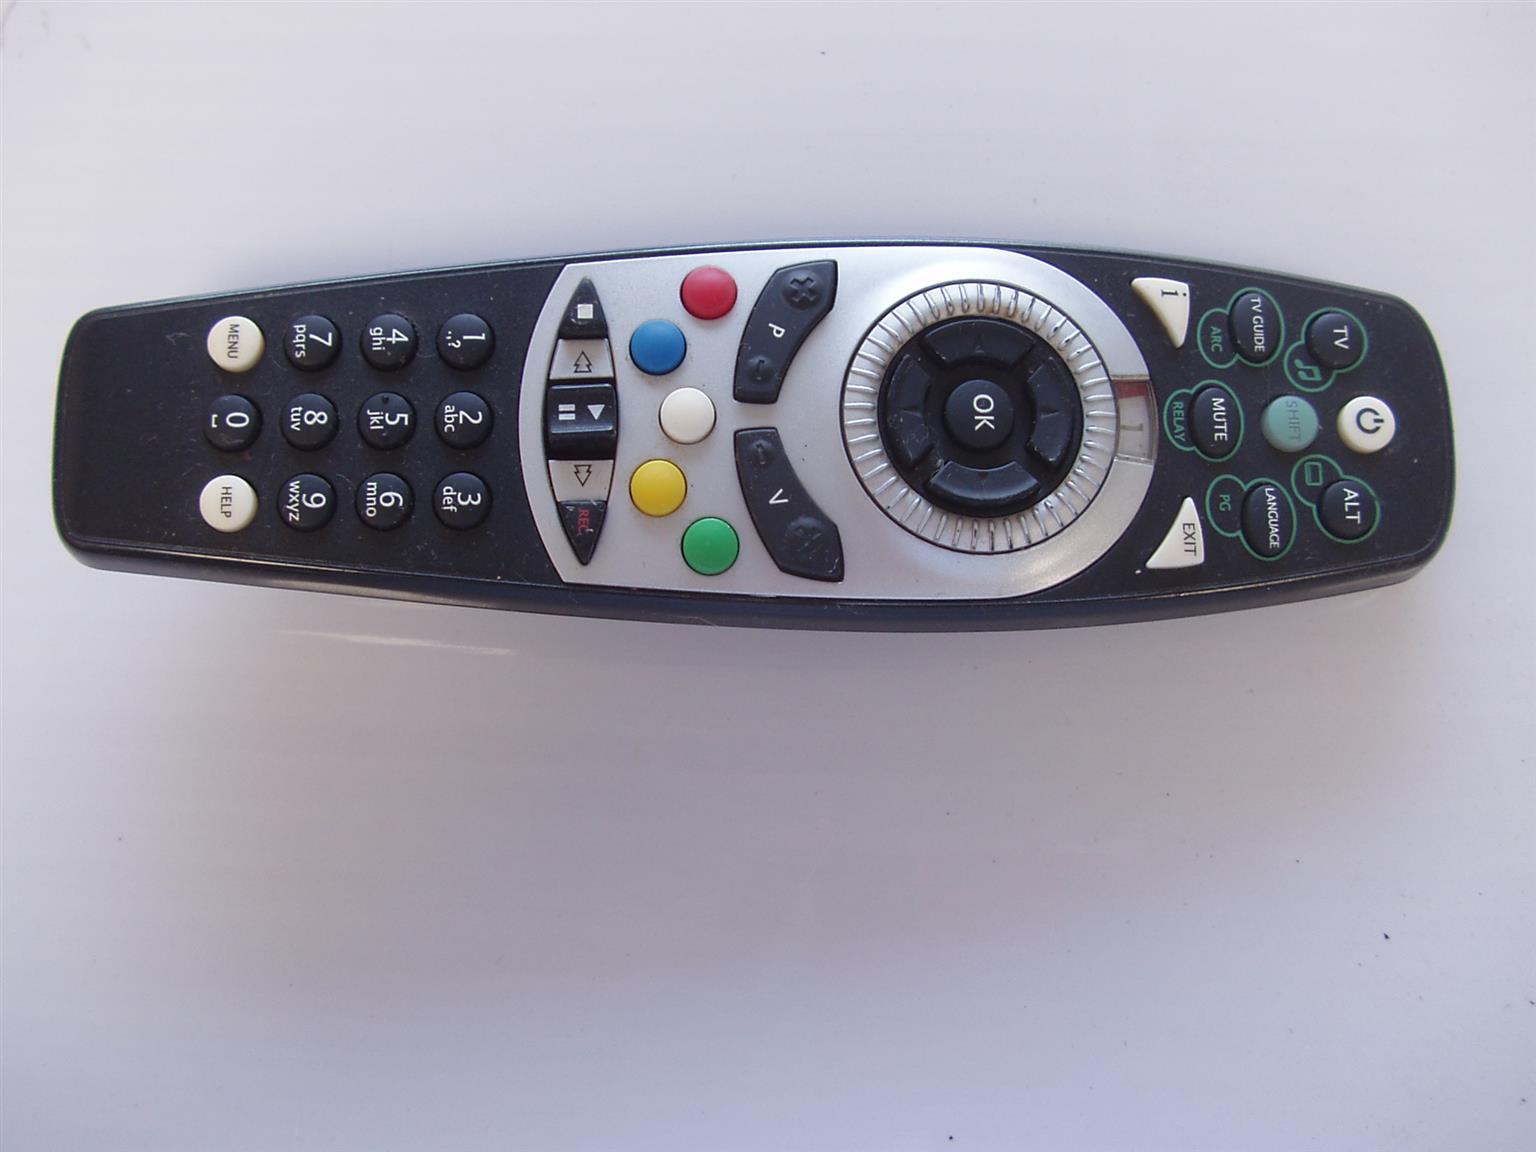 DSTV Remotes